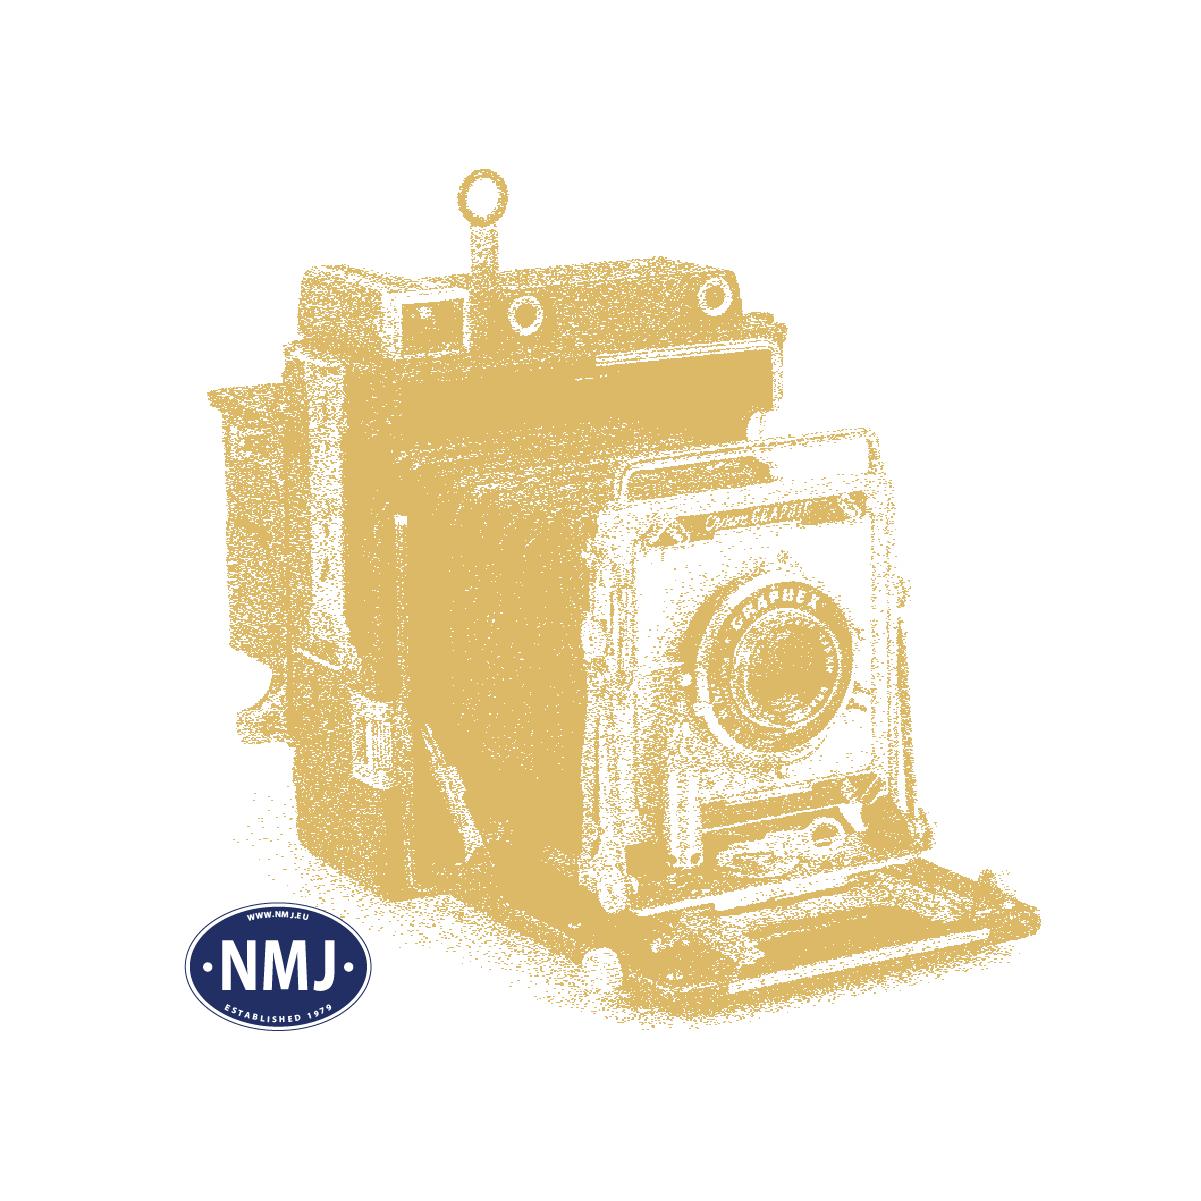 MBR55-1013 - Gressmatte #13, 30 x 40 Cm